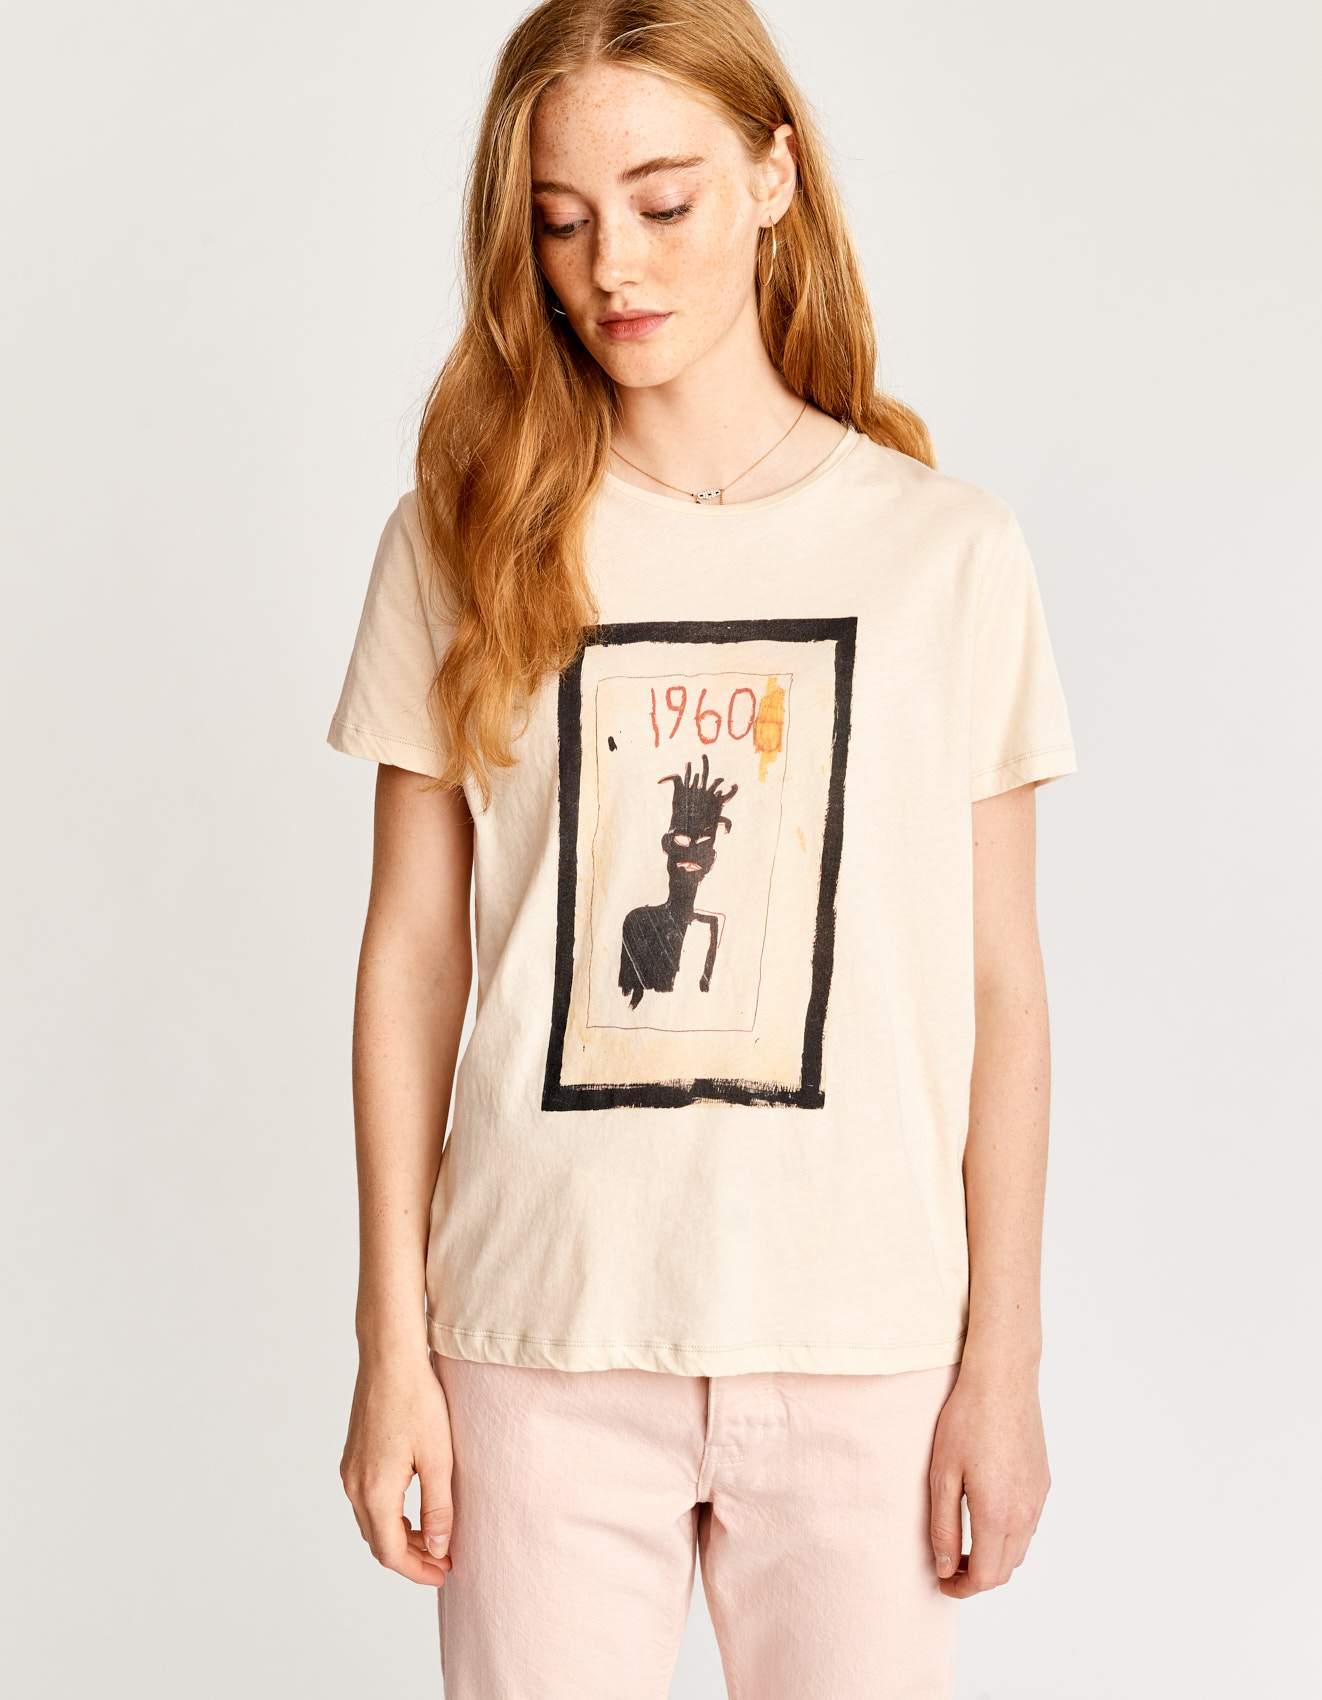 Bellerose-t-shirt-covi91-t1234m-milkyway_40_5000x5000.jpg